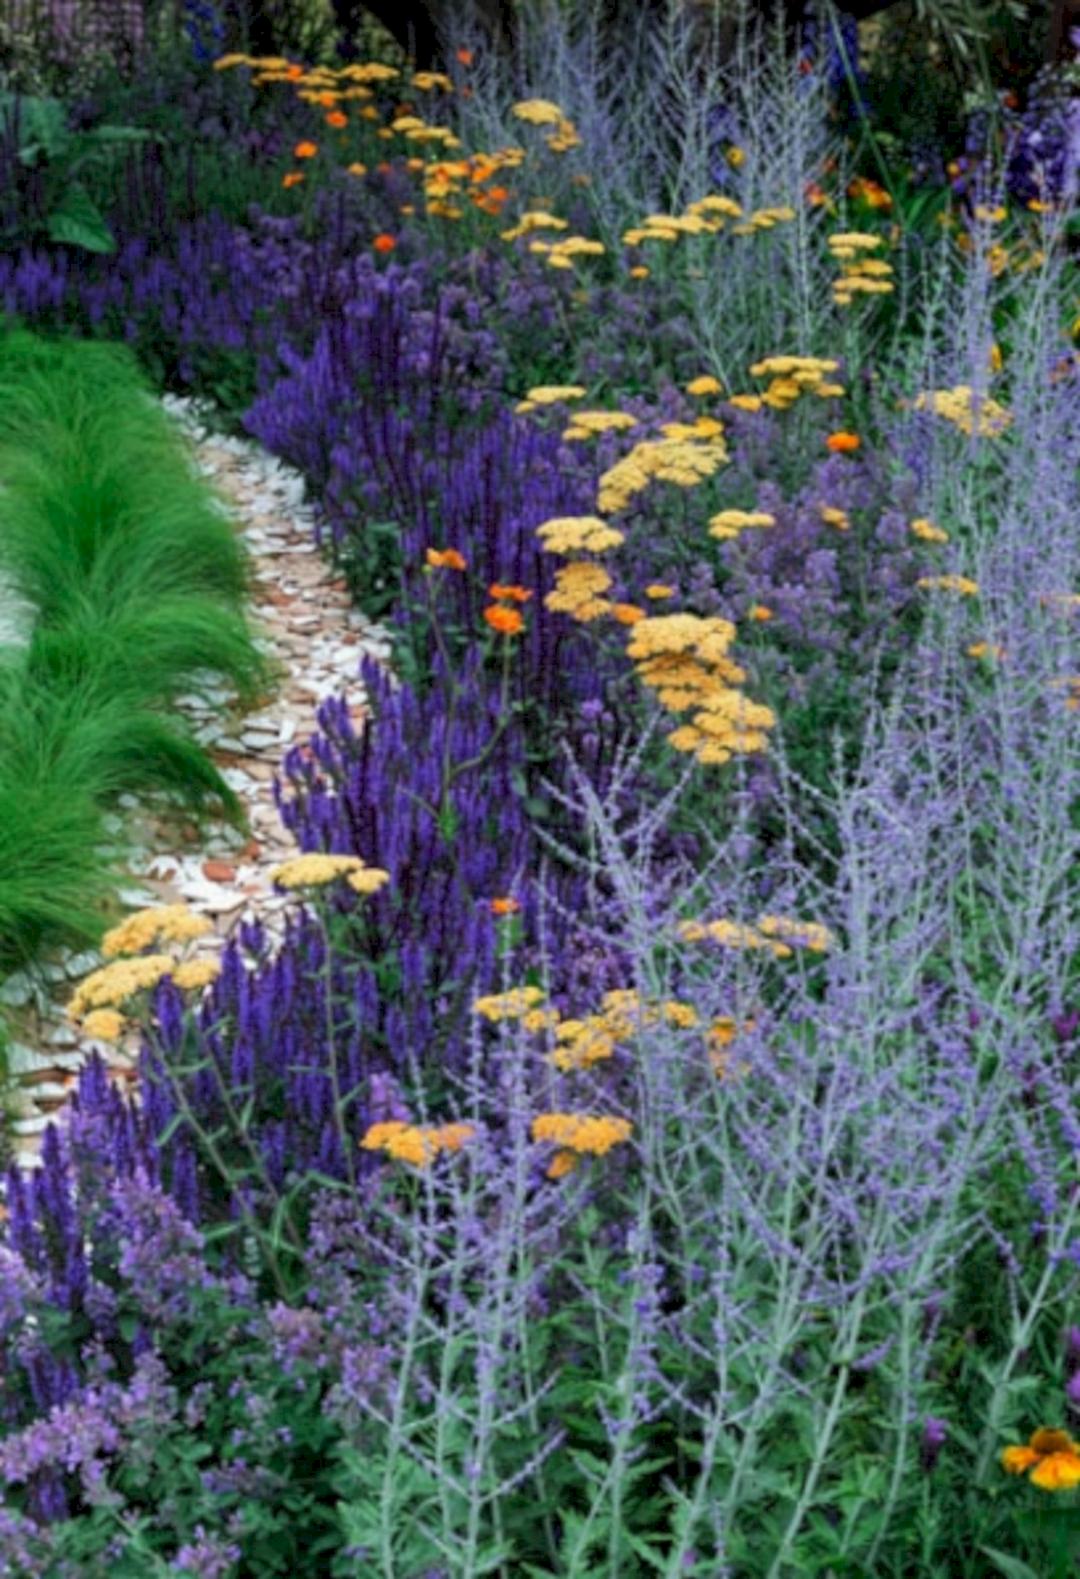 Best 75+ Best Planting Combination Ideas For Beautiful Garden Https://freshouz.com/75-best-planting-combinatio… | Plants, Butterfly Garden Design, Beautiful Gardens